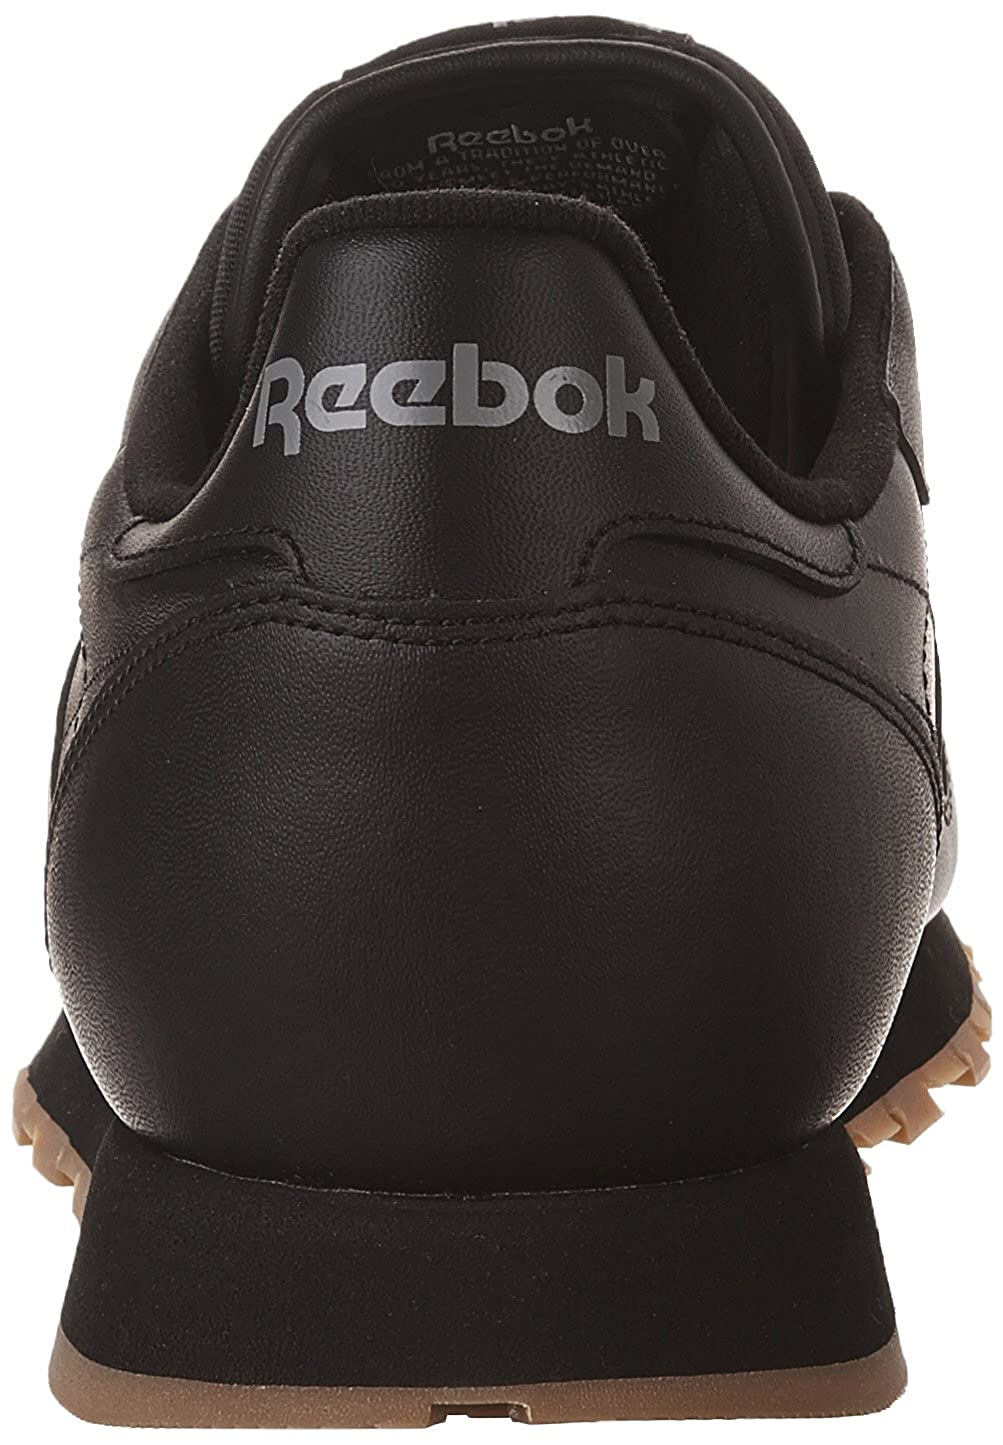 11a8ca75d92 Reebok Classic Men s Classic Leather Fashion Sneakers  Reebok  Amazon.ca   Shoes   Handbags